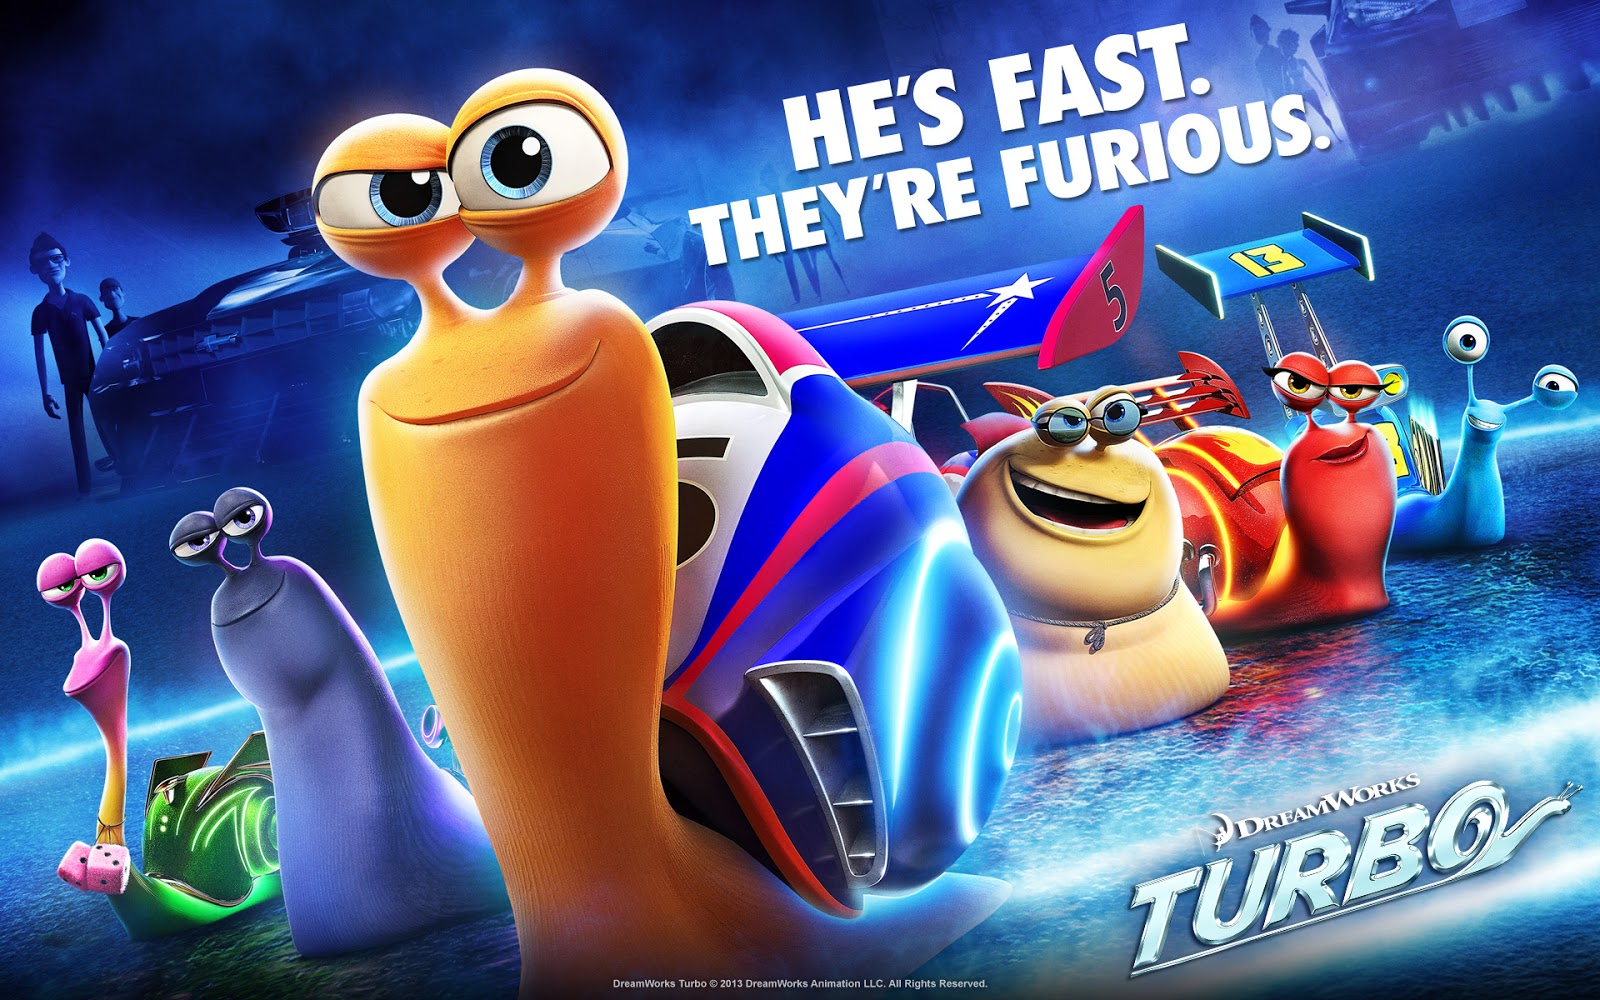 Turbo movie cg3 voltagebd Gallery